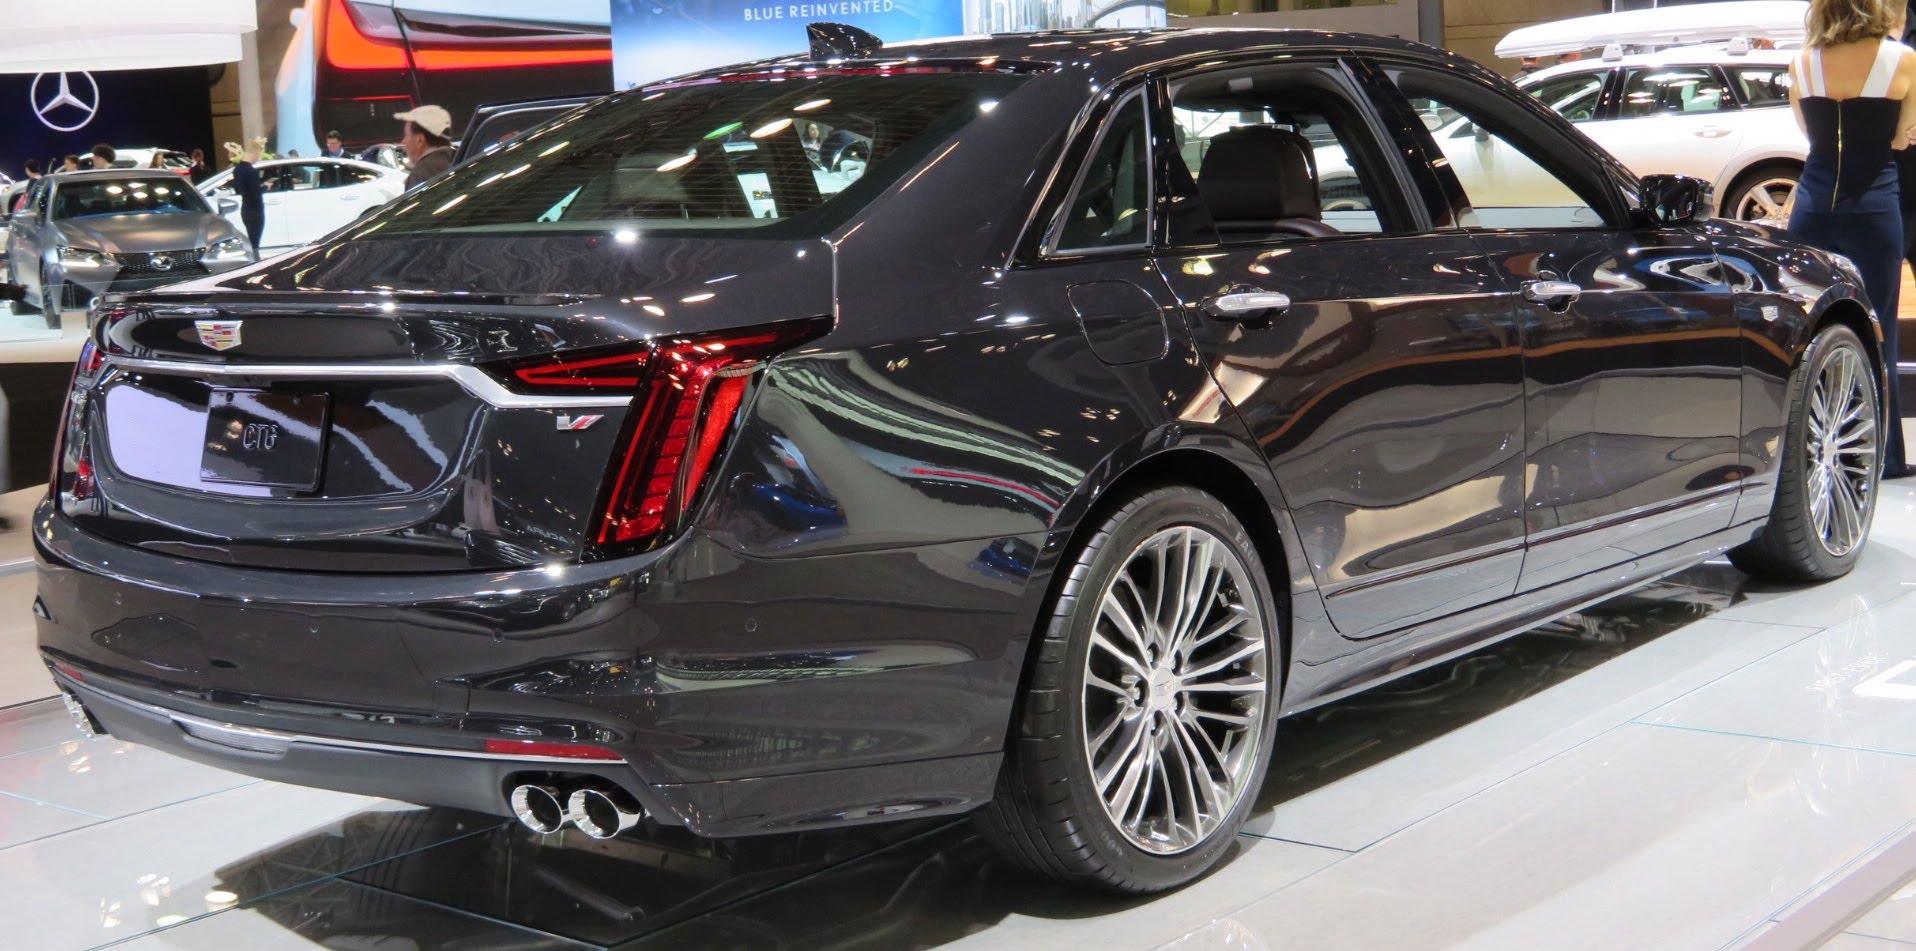 2018 Cts Cadillac >> File:2019 Cadillac CT6 V-Sport rear 4.2.18.jpg - Wikimedia Commons